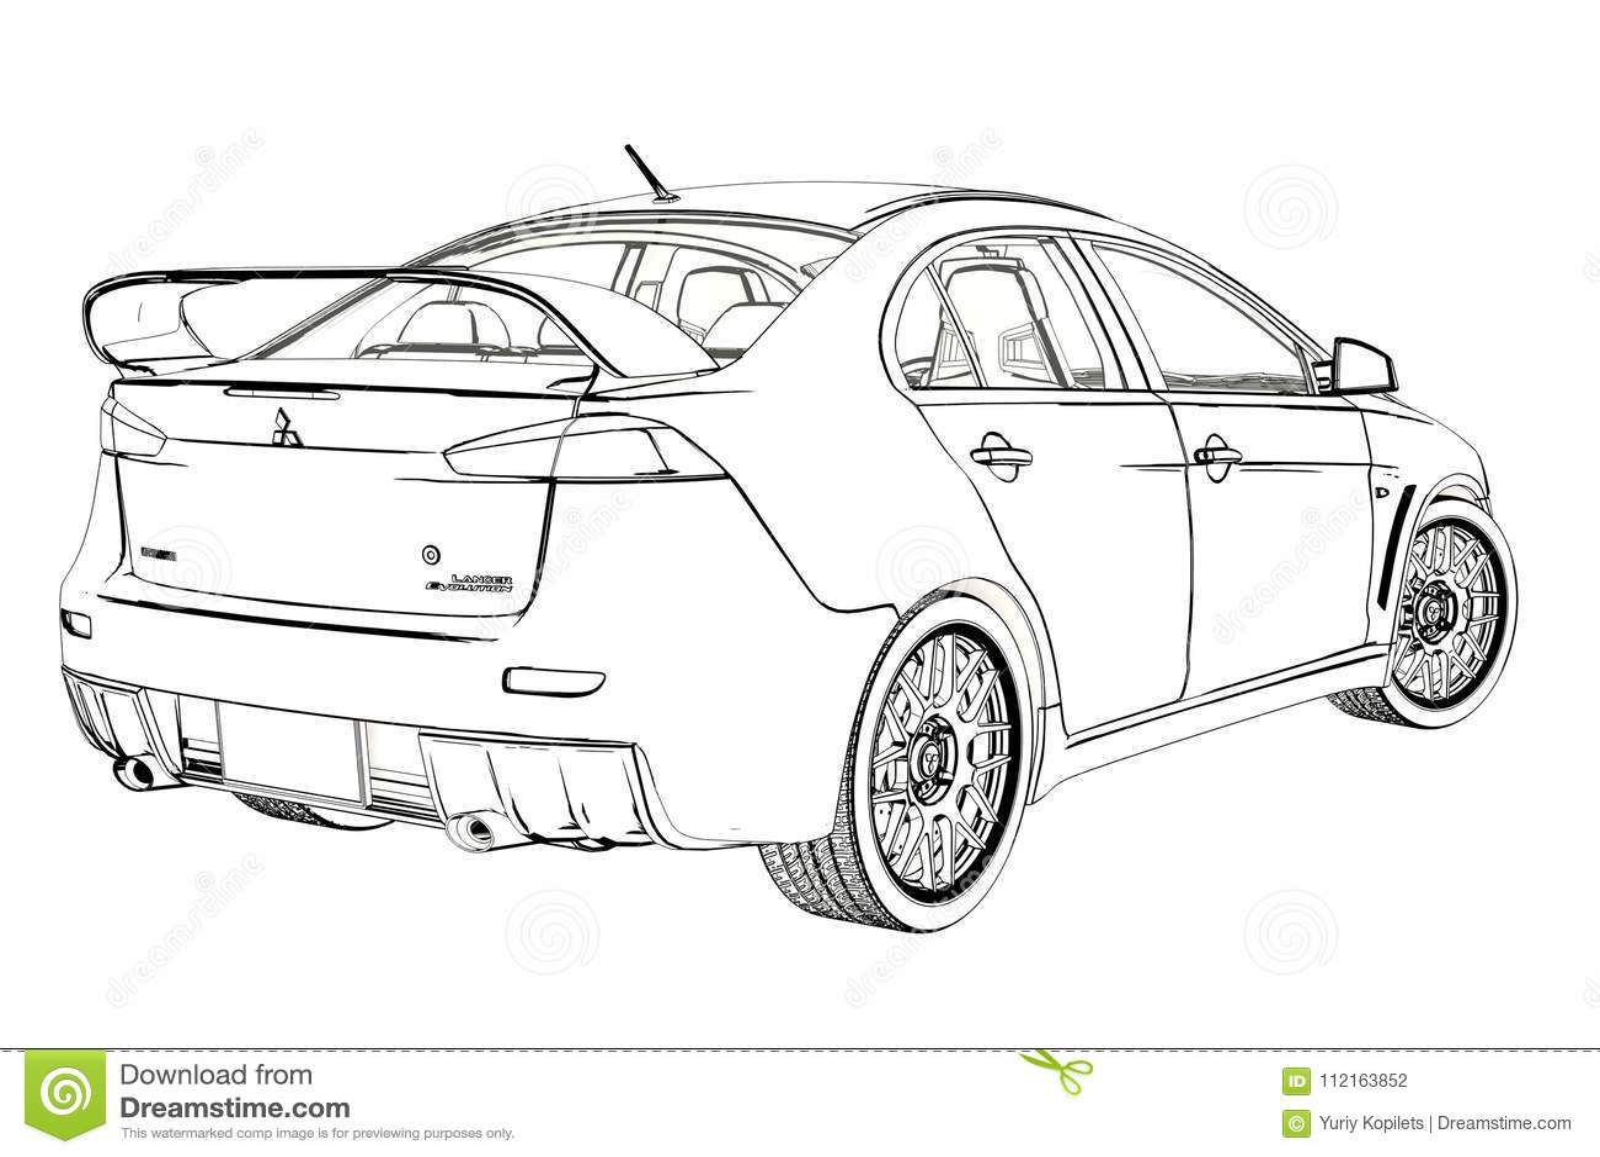 Sedan Mitsubishi Evolution X Sketch 3d Illustration